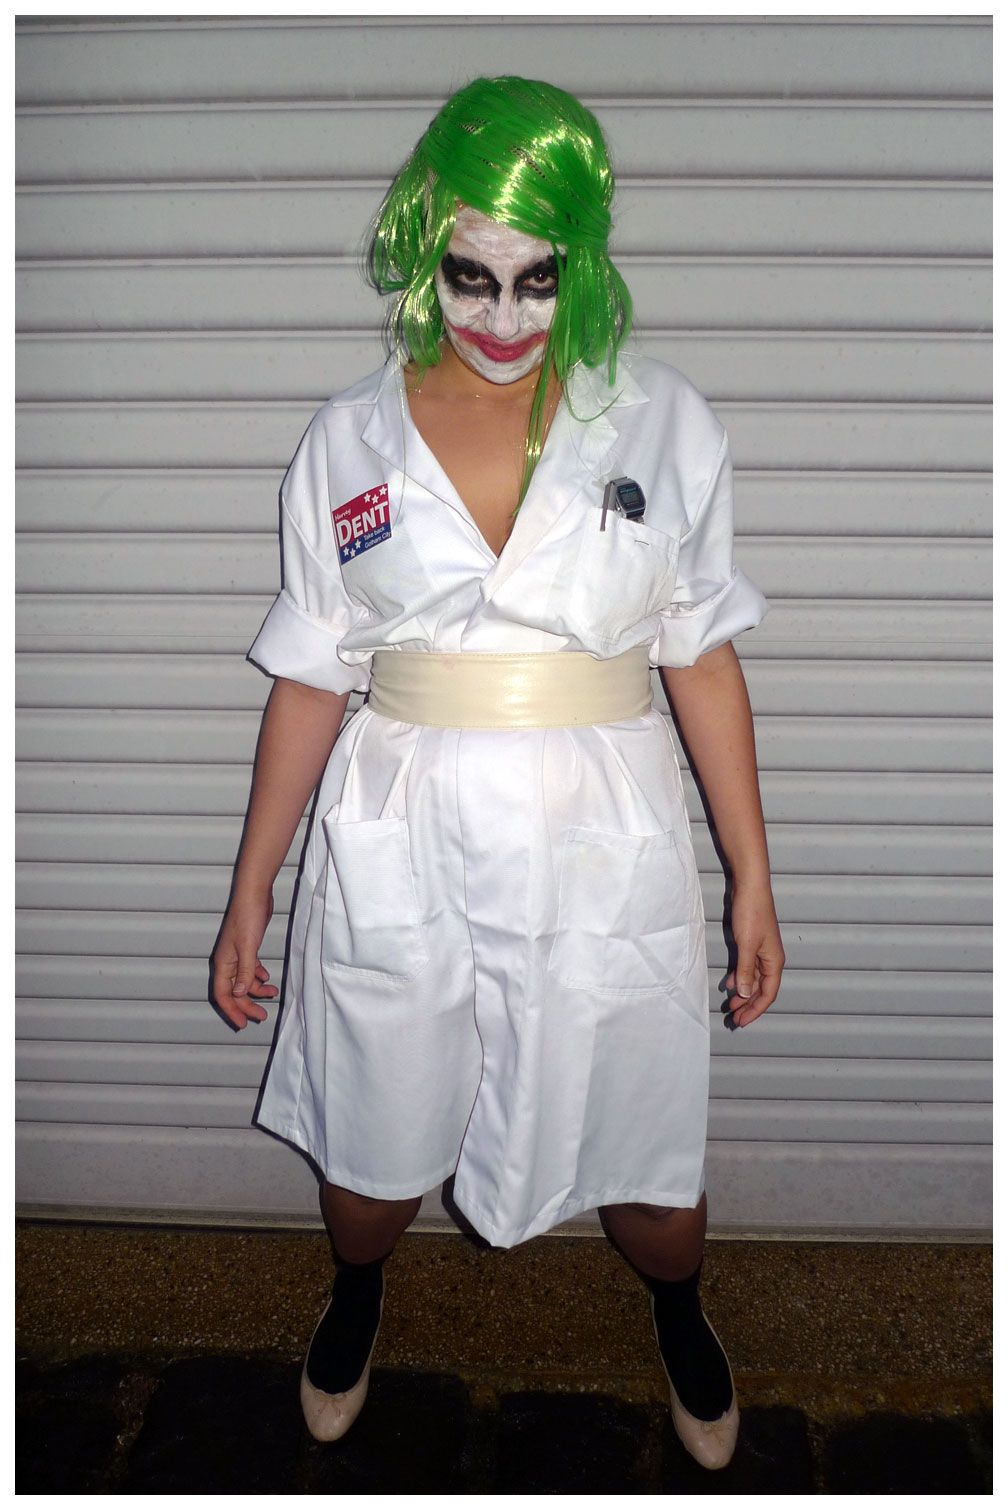 8a936cf2aeda7 Heath Ledger Joker Nurse Costume. Get more #costume and #Halloween  inspiration on this blog! Over 400 homemade, DIY costume ideas!